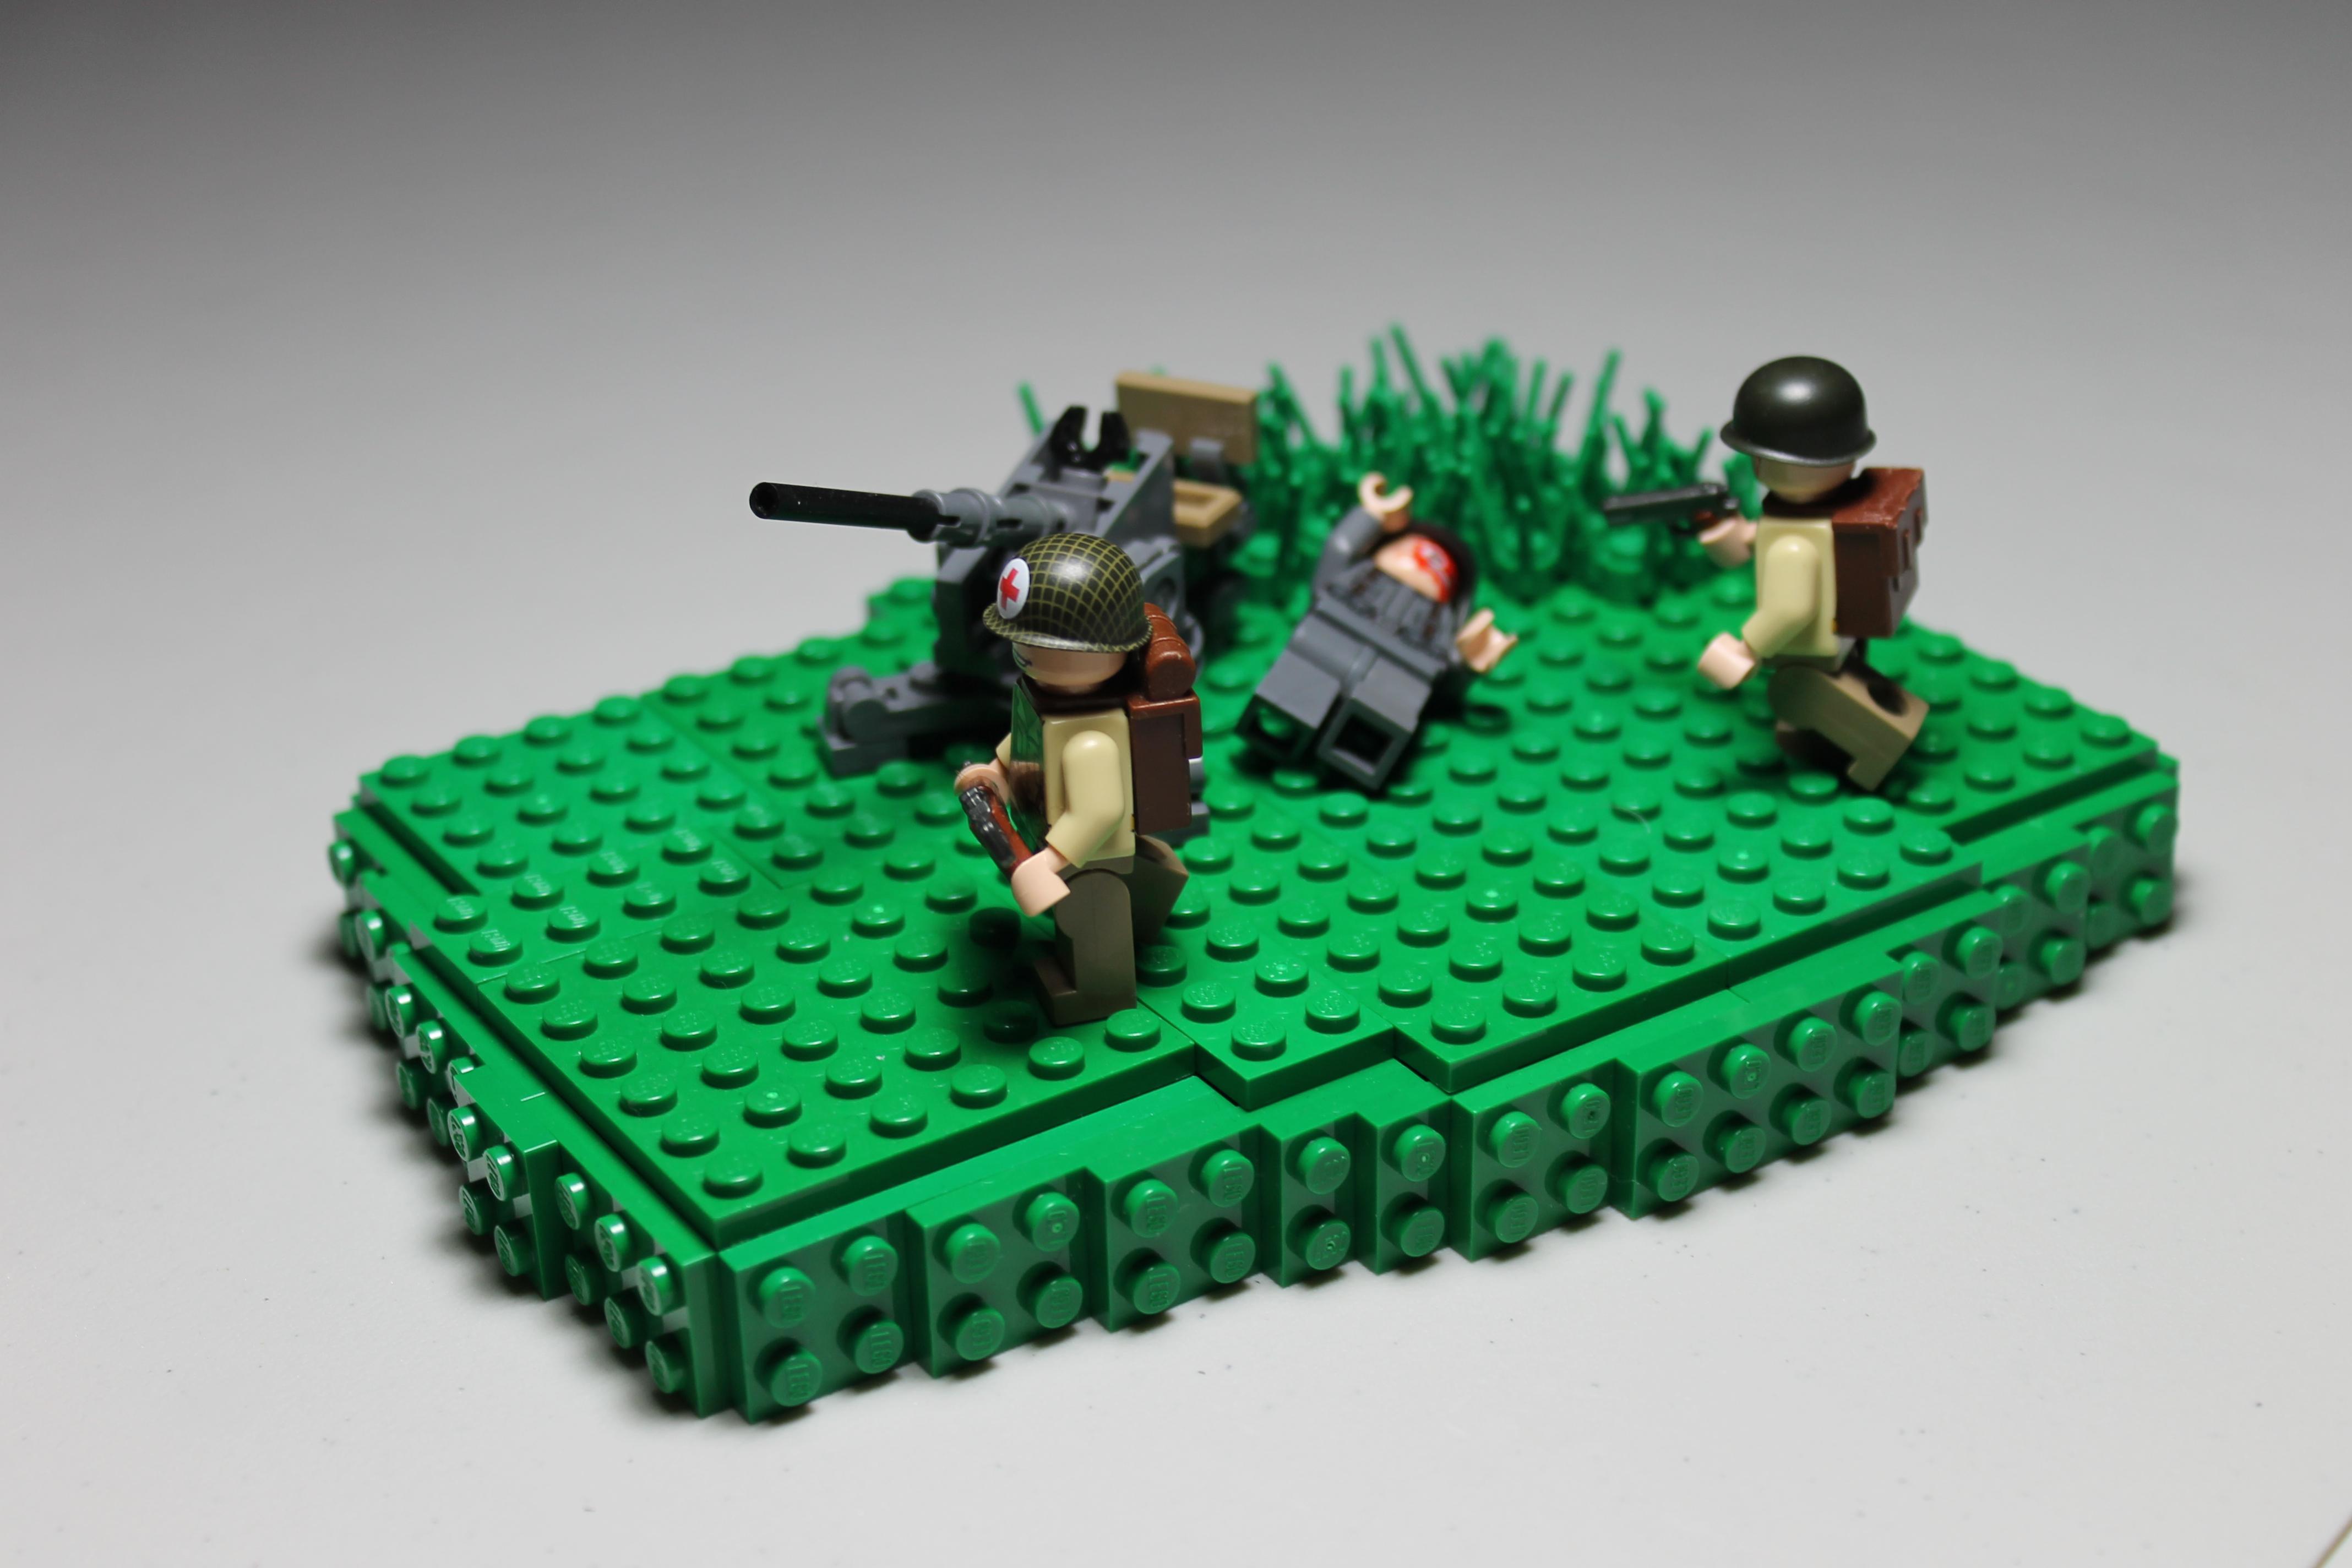 лего военная тематика картинки что